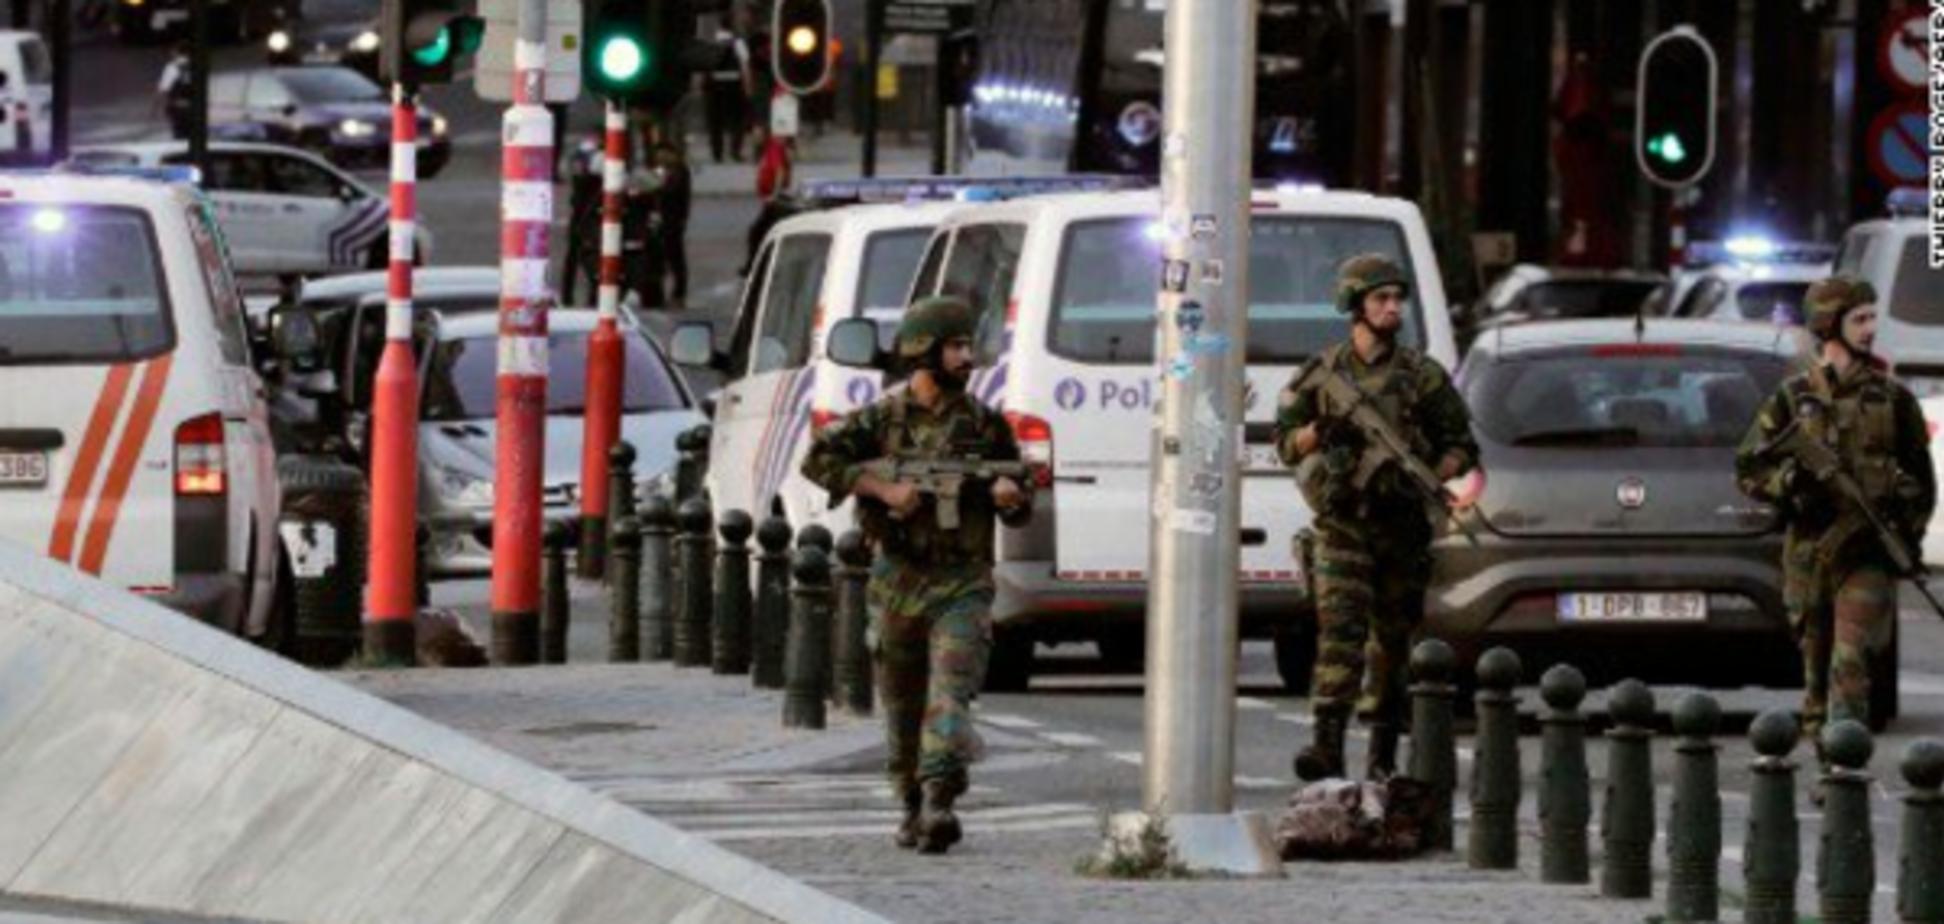 Теракт в Брюсселі